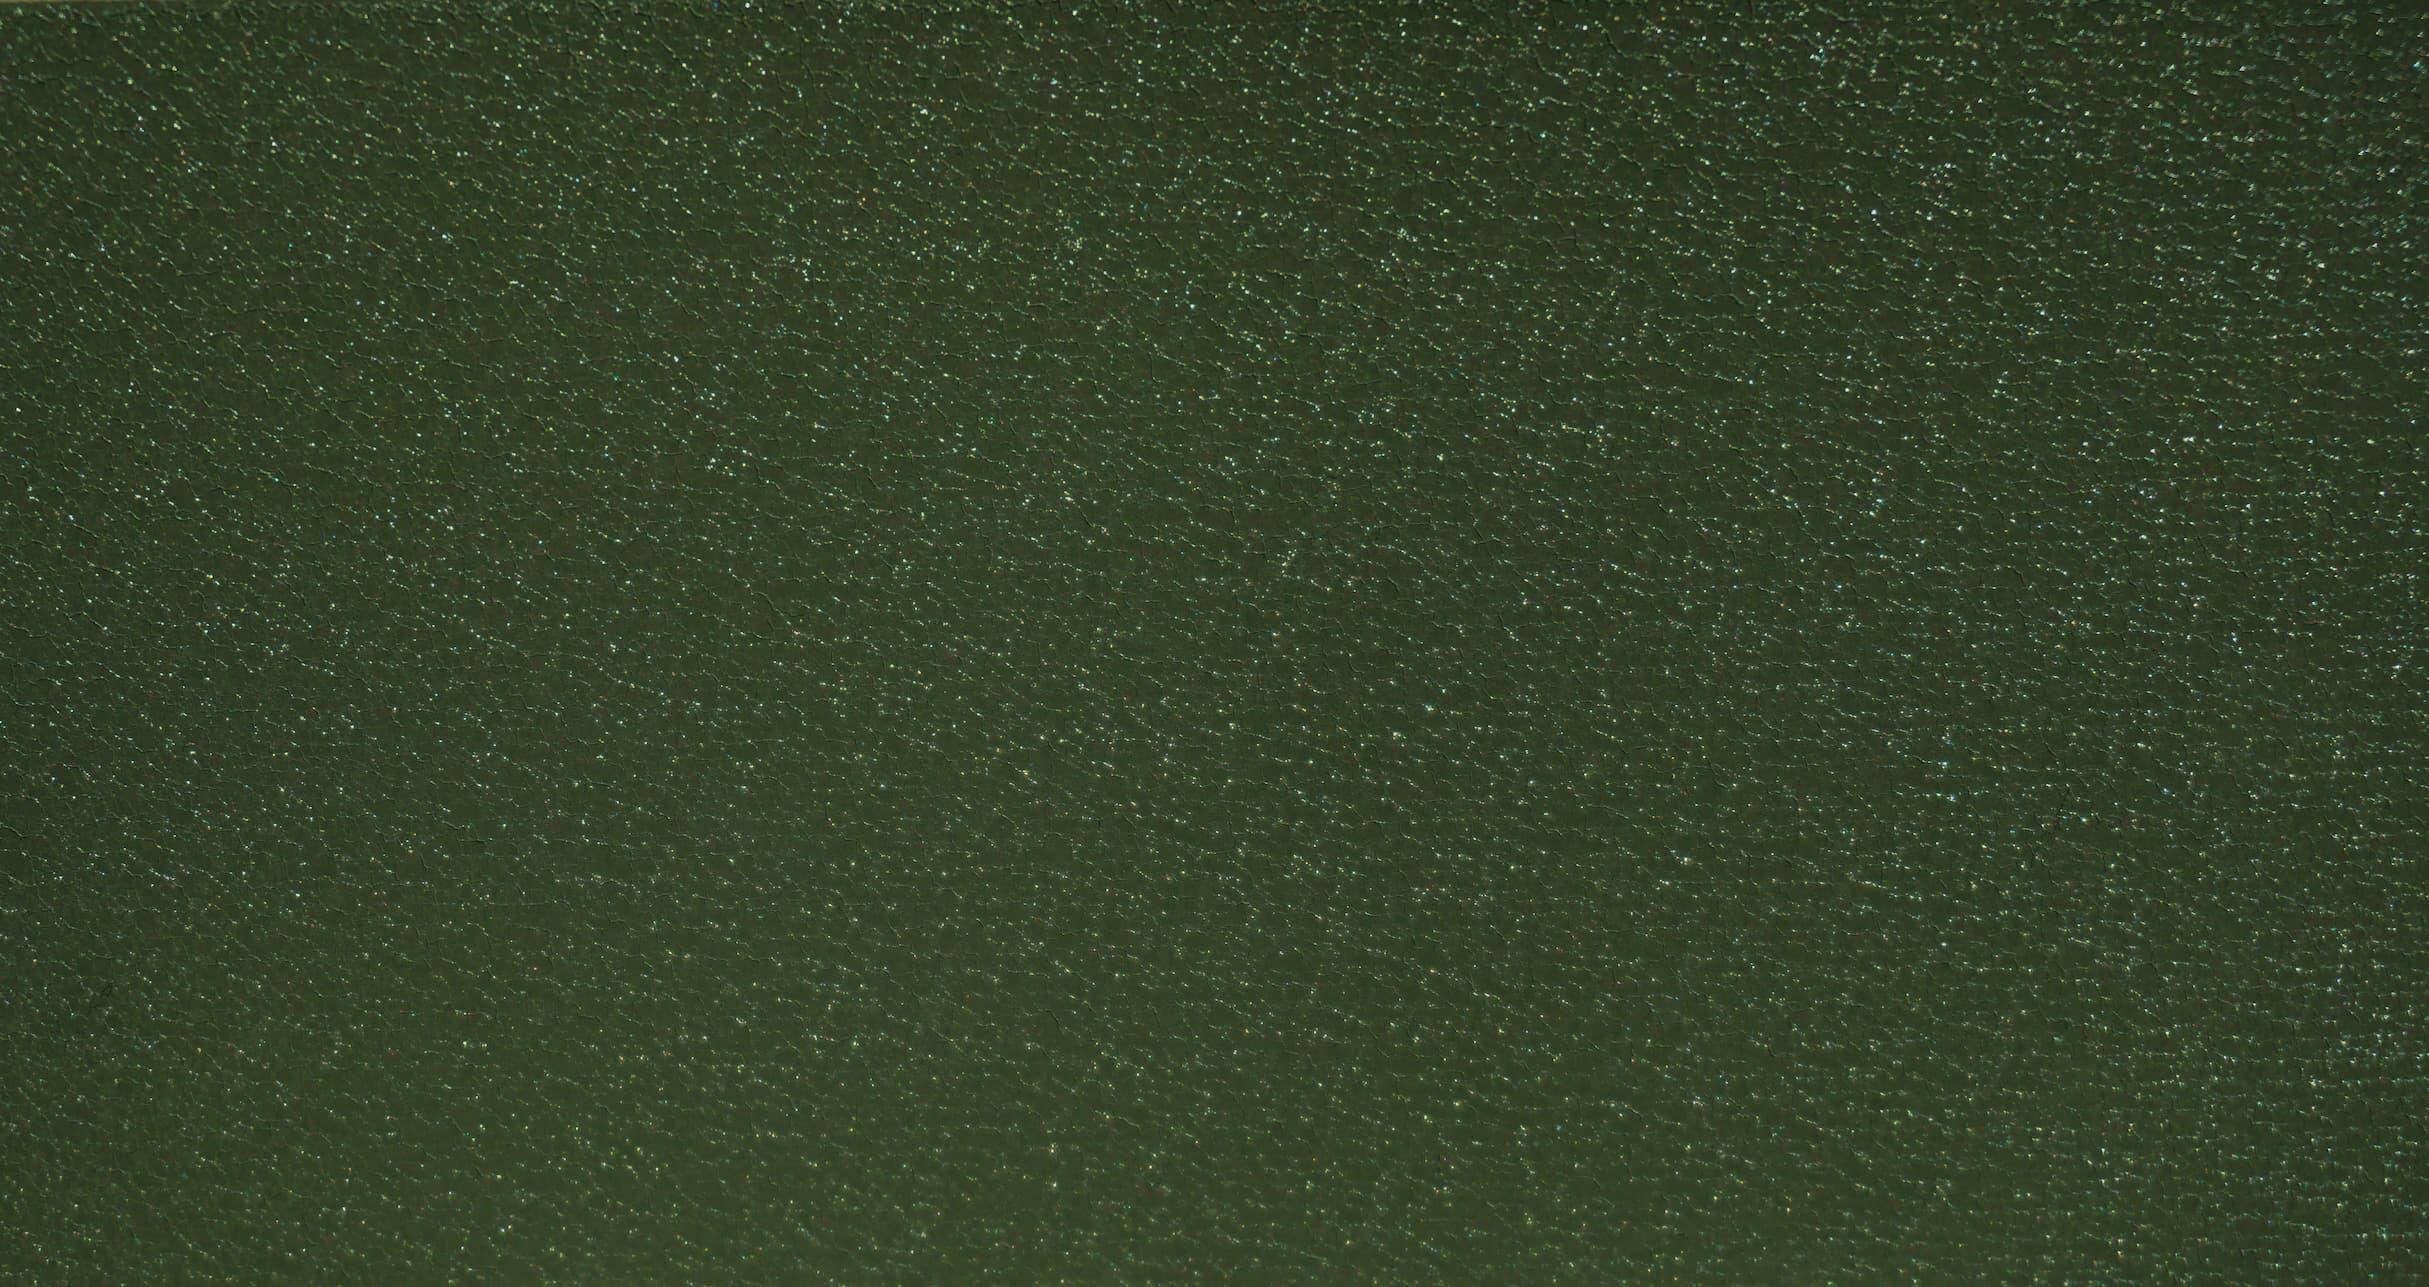 Textured evergreen